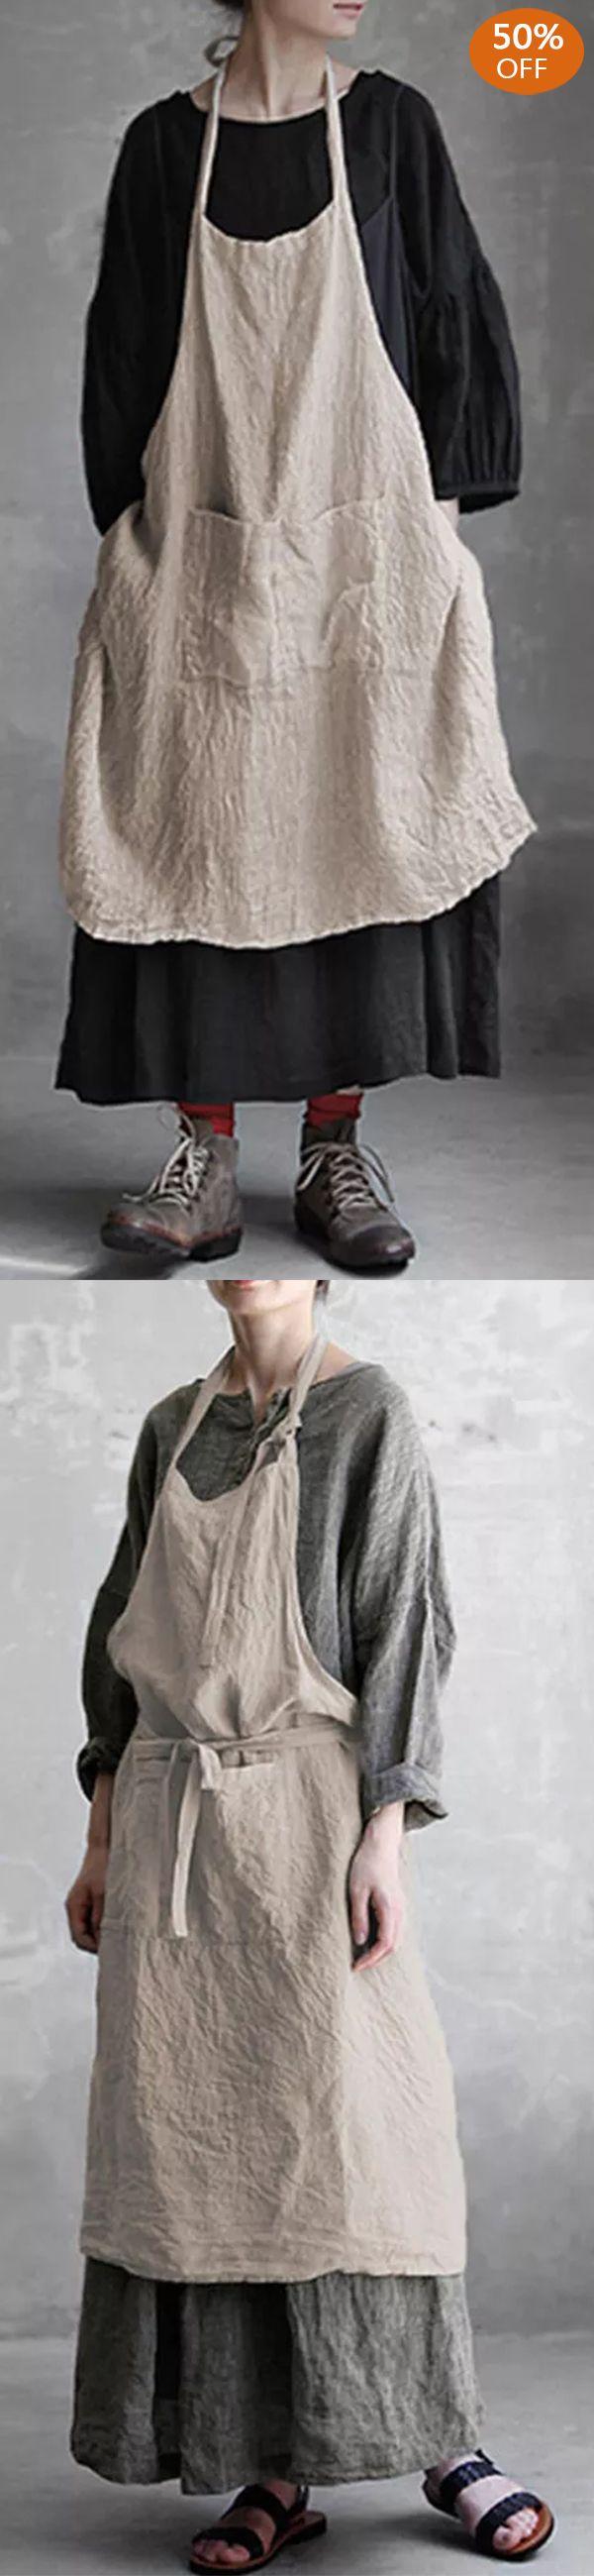 Vintage Pockets Cotton Linen Dress -   19 simple crafts kindergarten ideas